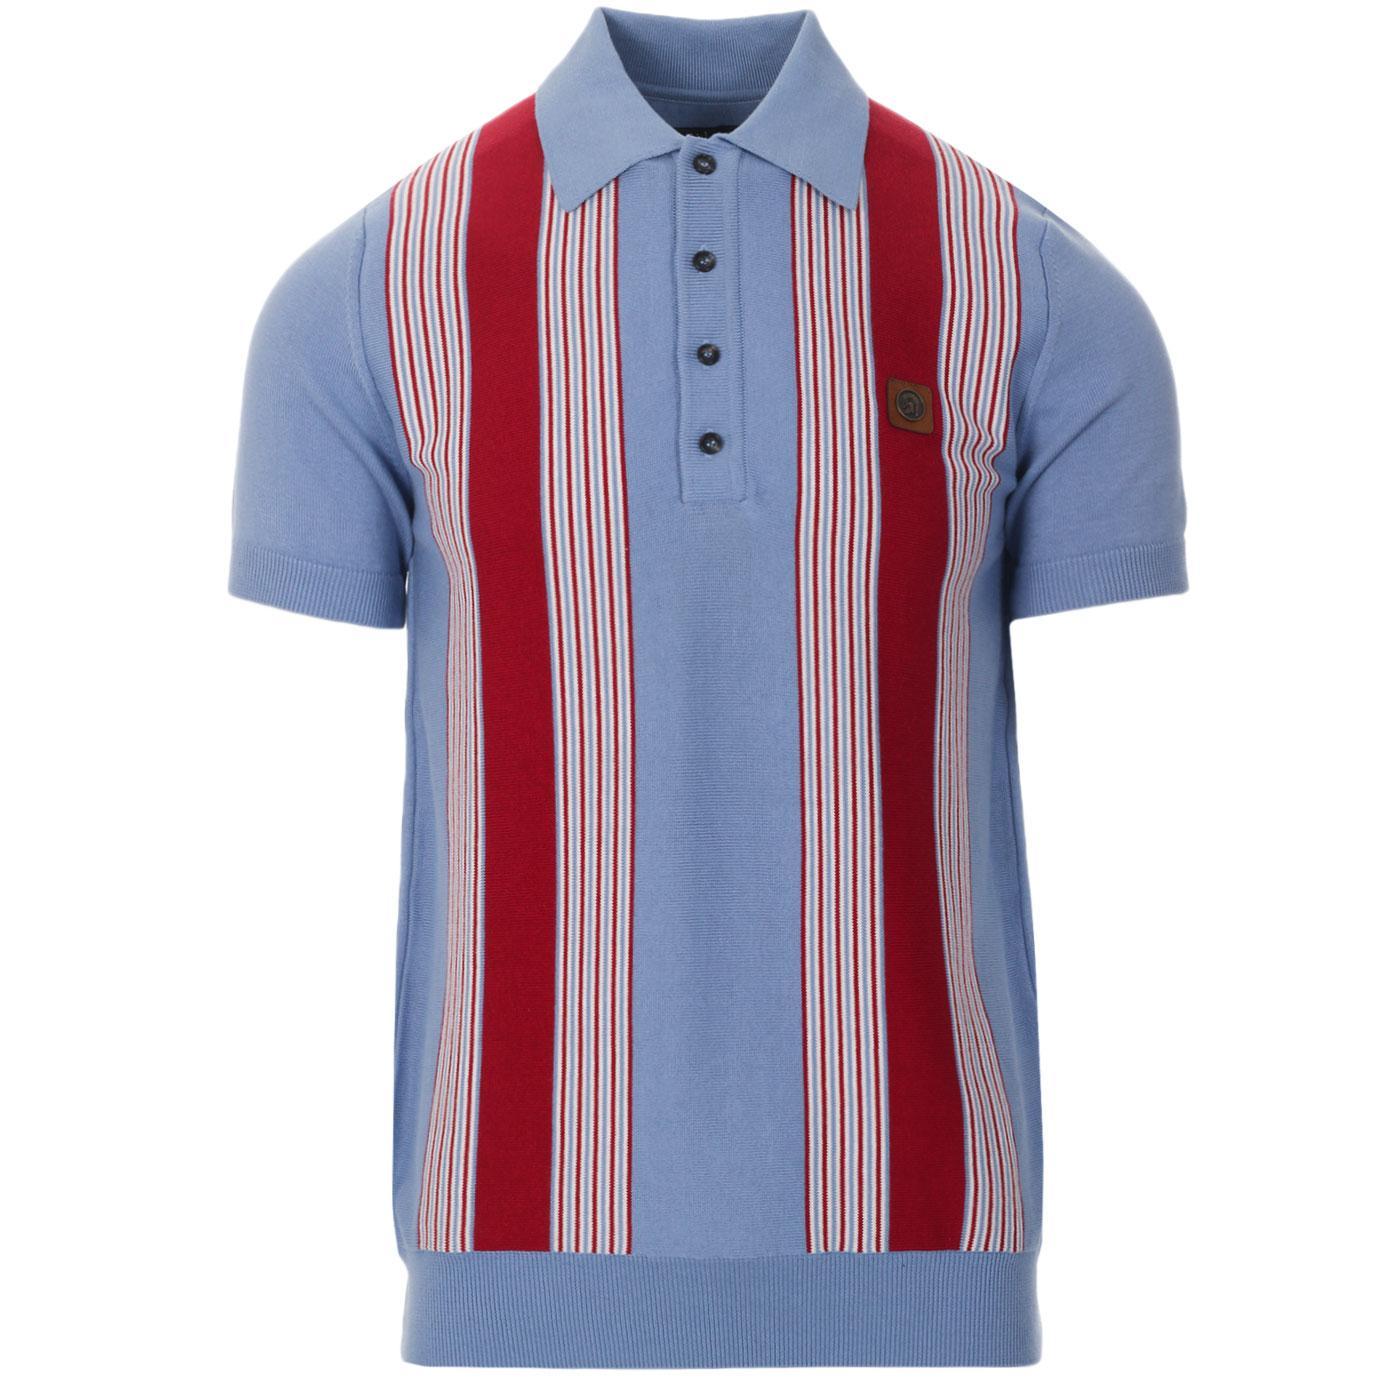 TROJAN RECORDS Ska Mod Stripe Knit Polo Top (Sky)